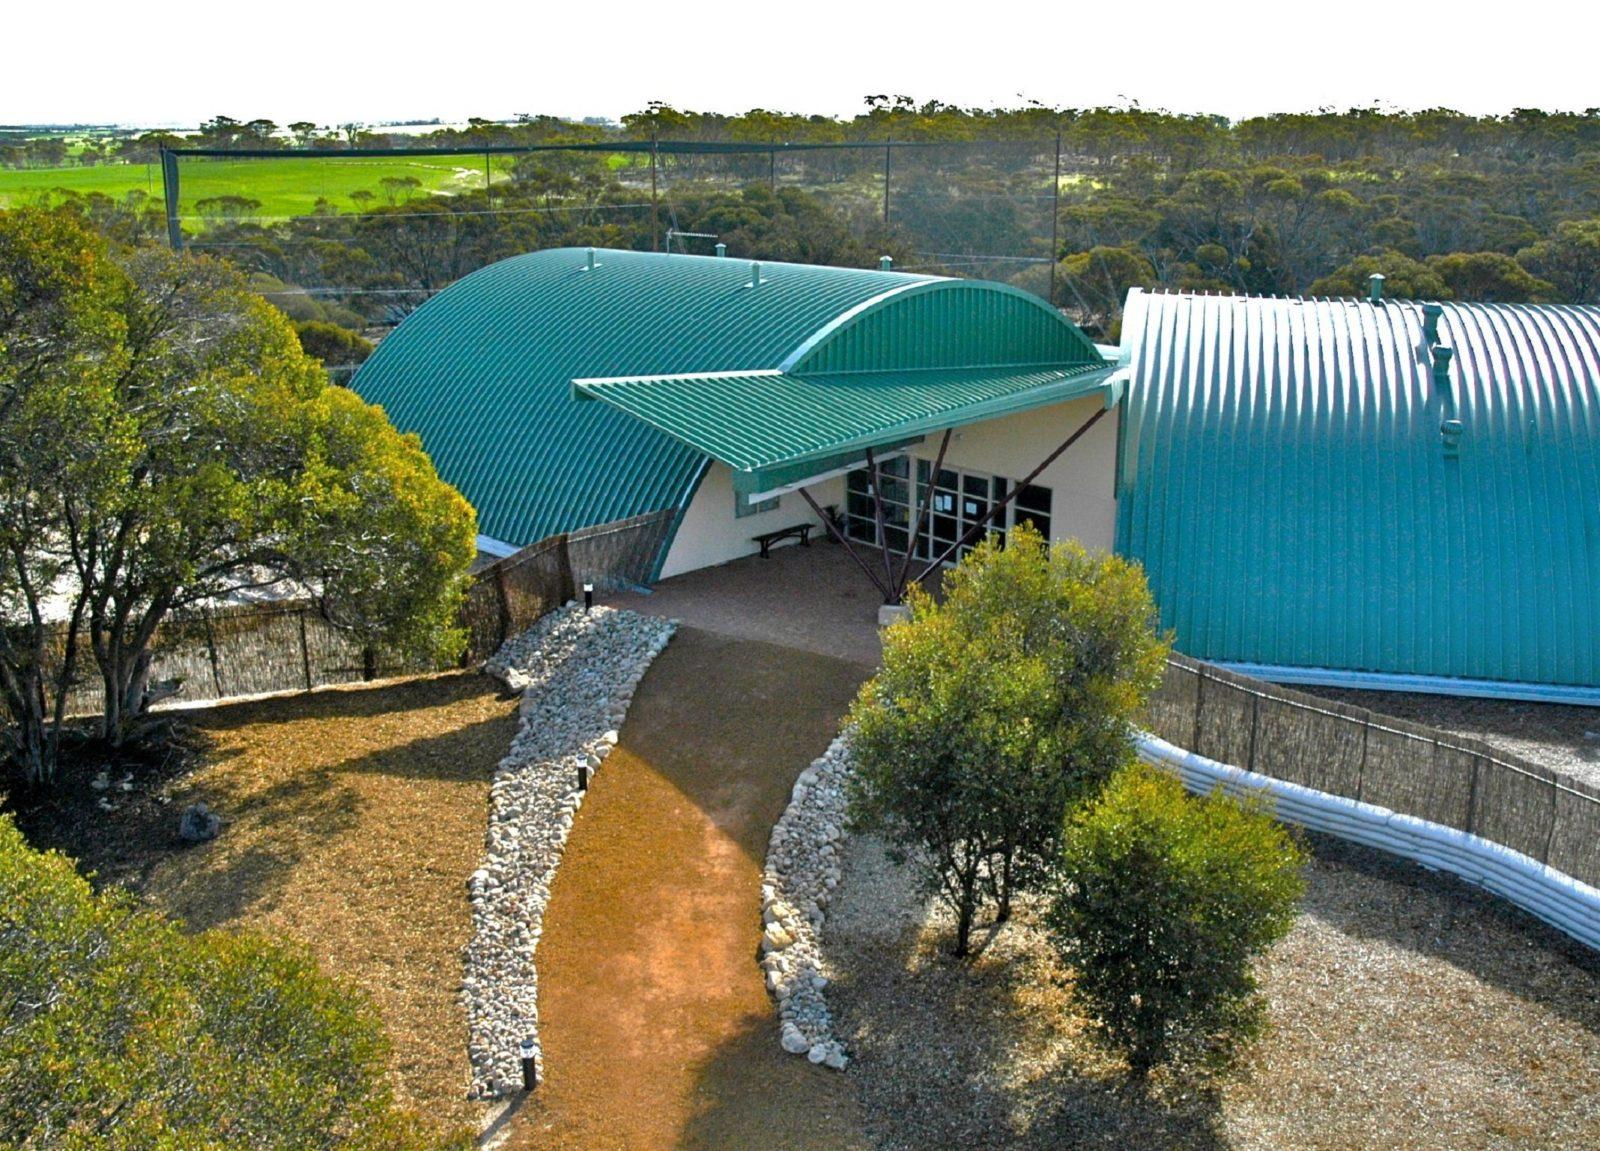 Yongergnow Australian Malleefowl Centre, Ongerup, Western Australia